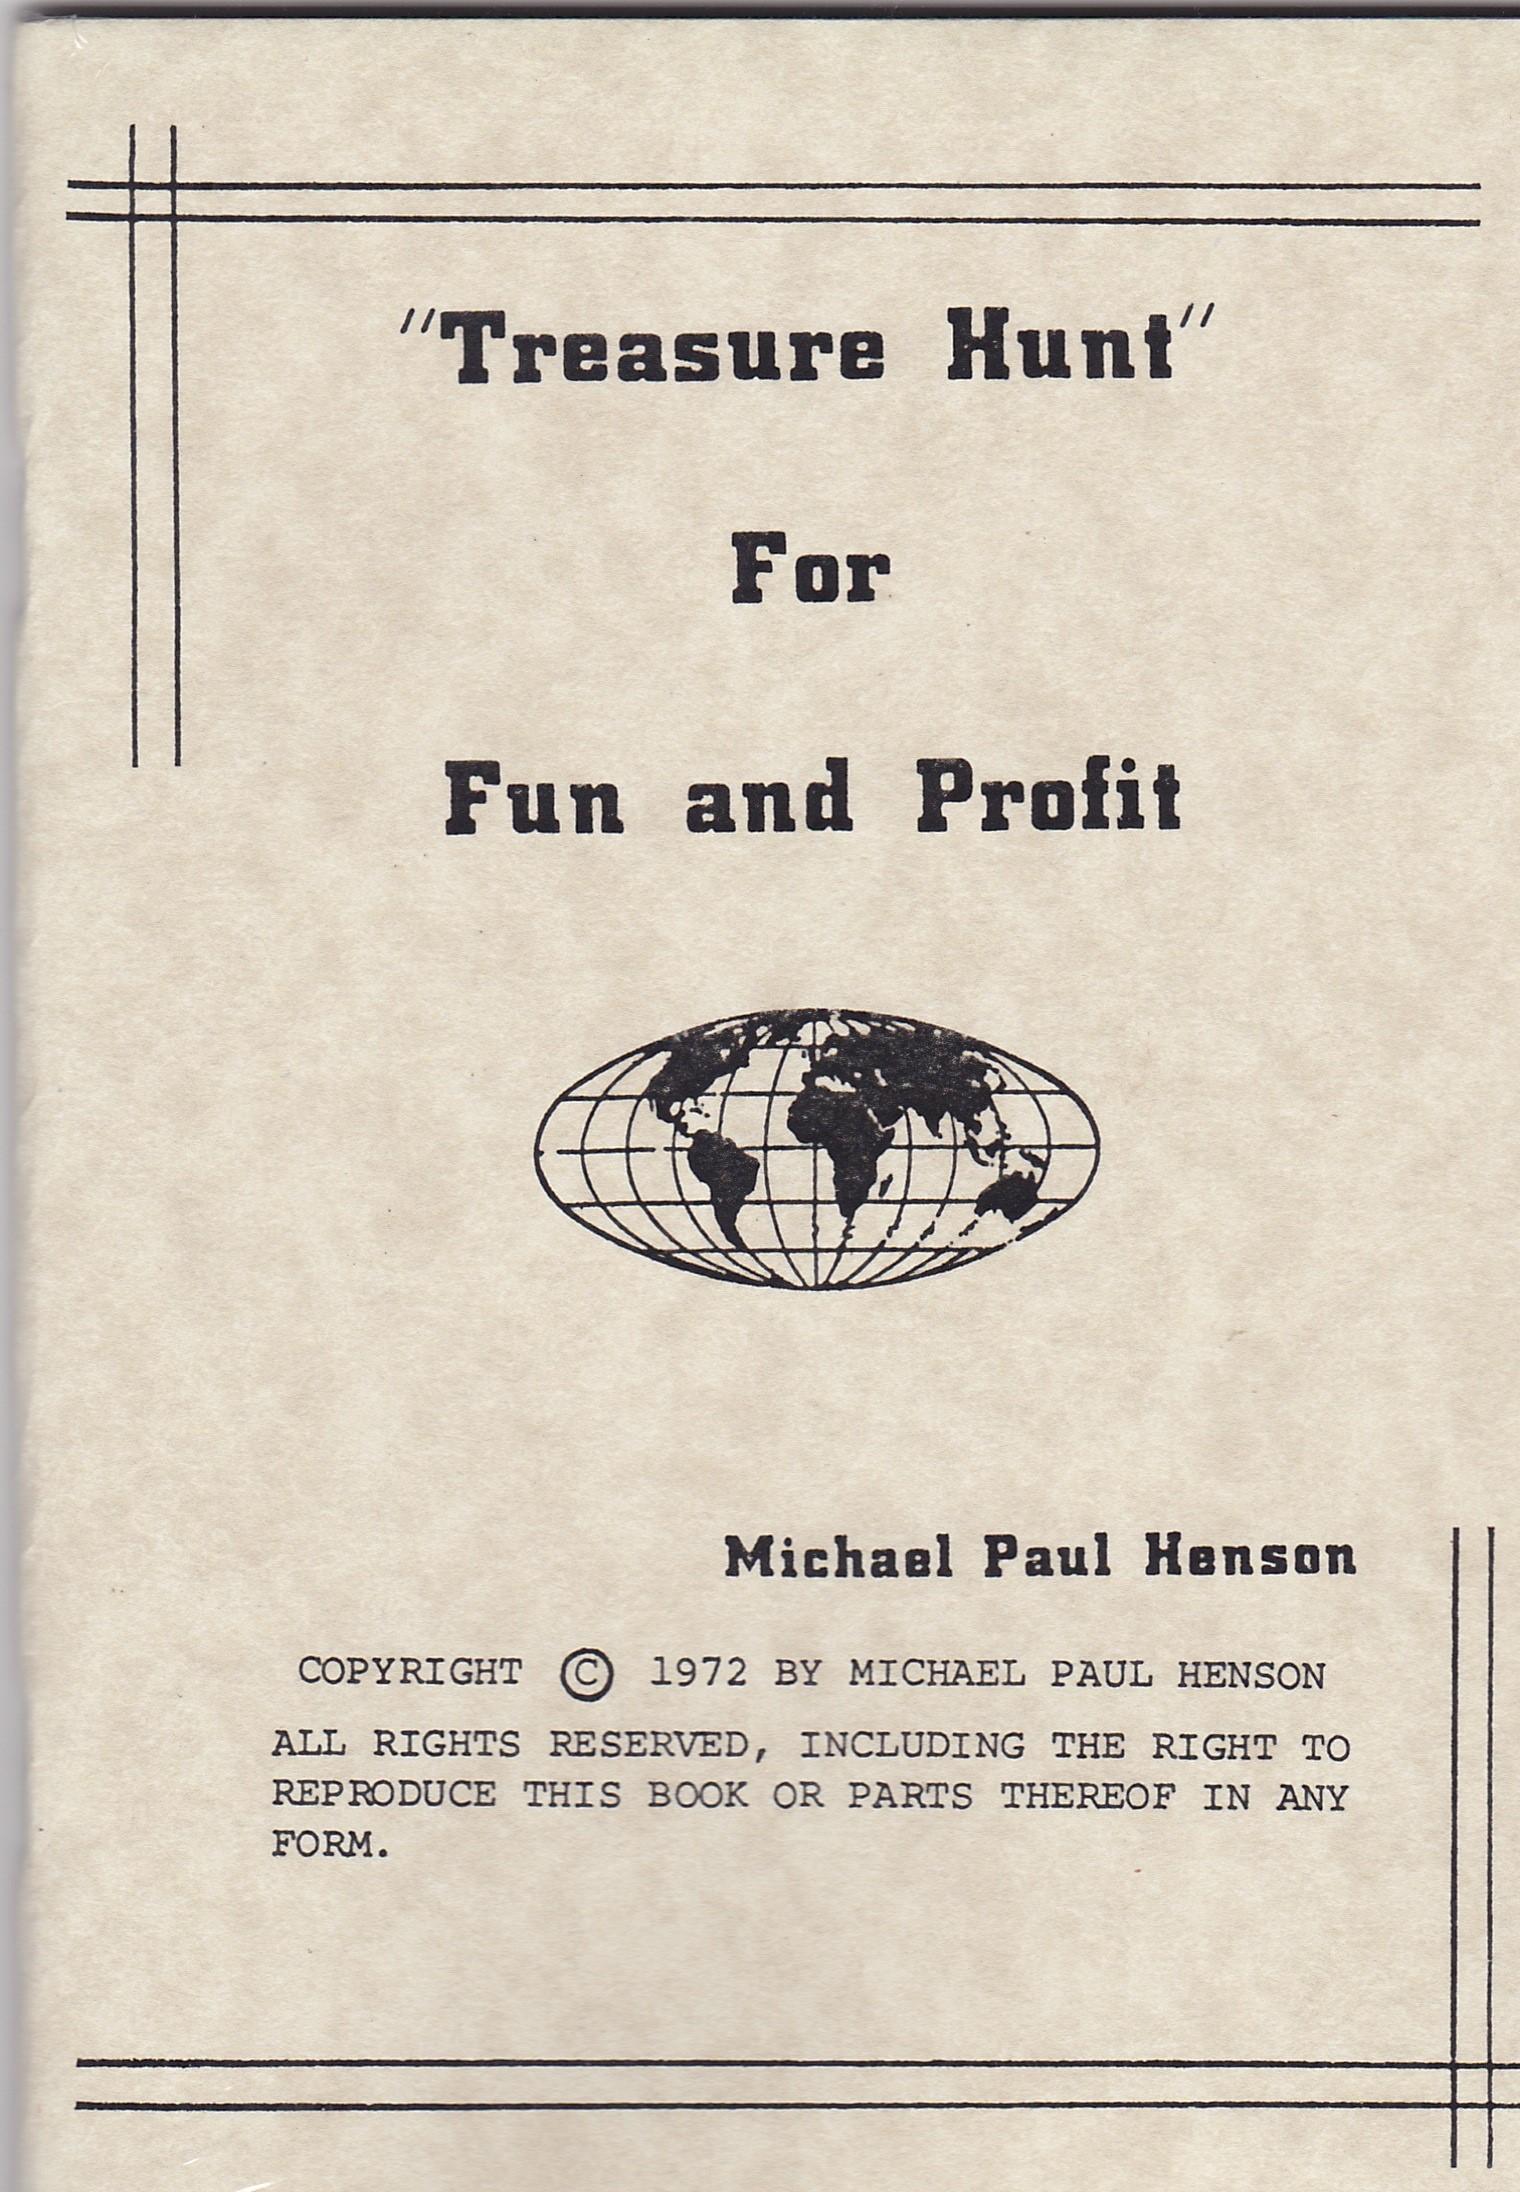 Fun & Profit in Treasure Hunting #822